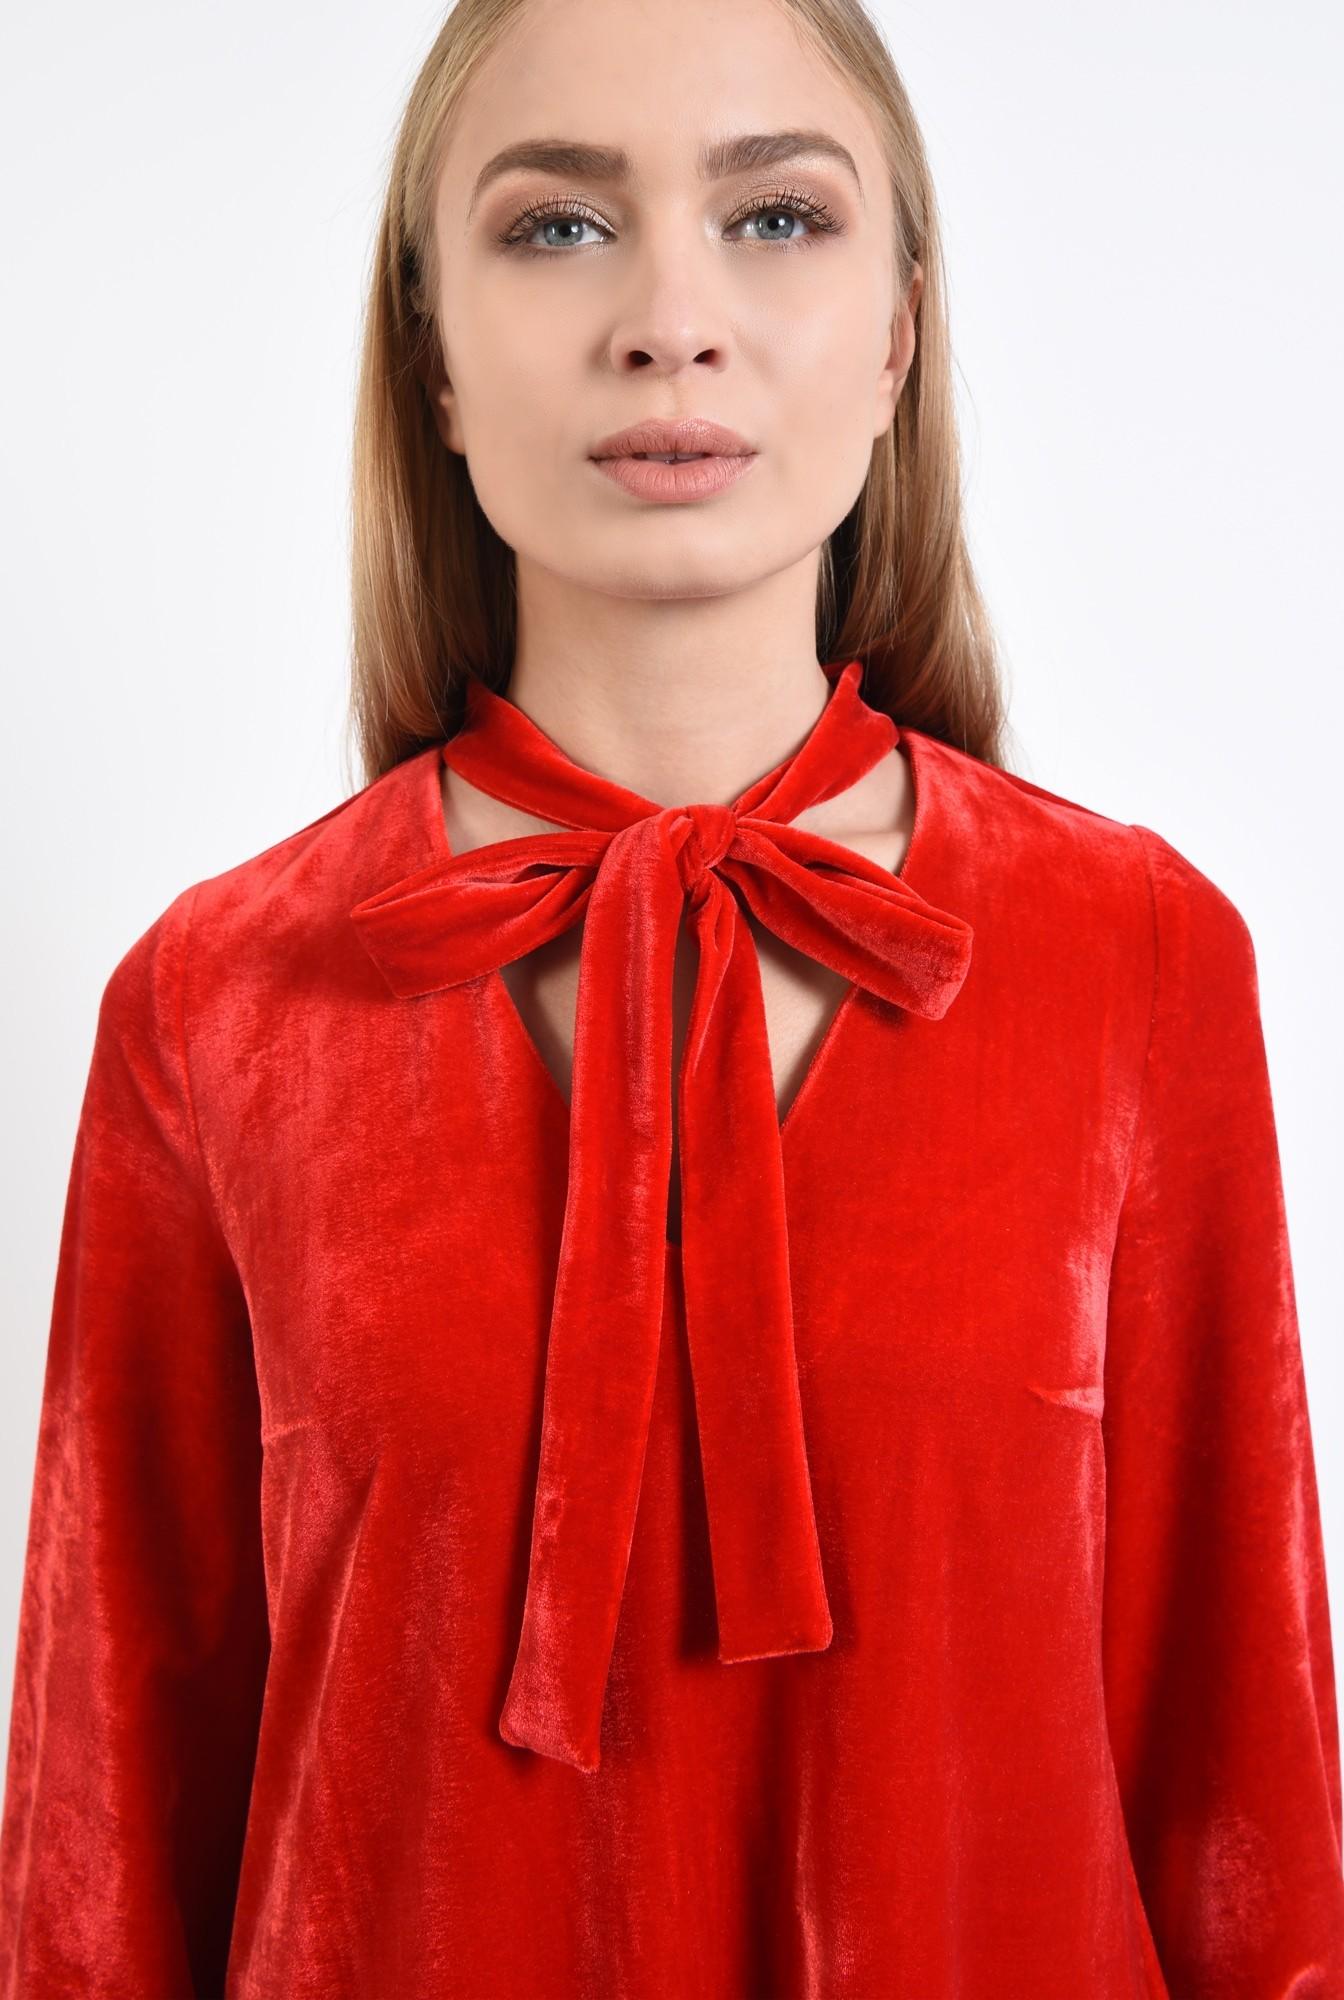 2 - rochie rosie, mini, croi larg, maneci bufante, decolteu anchior